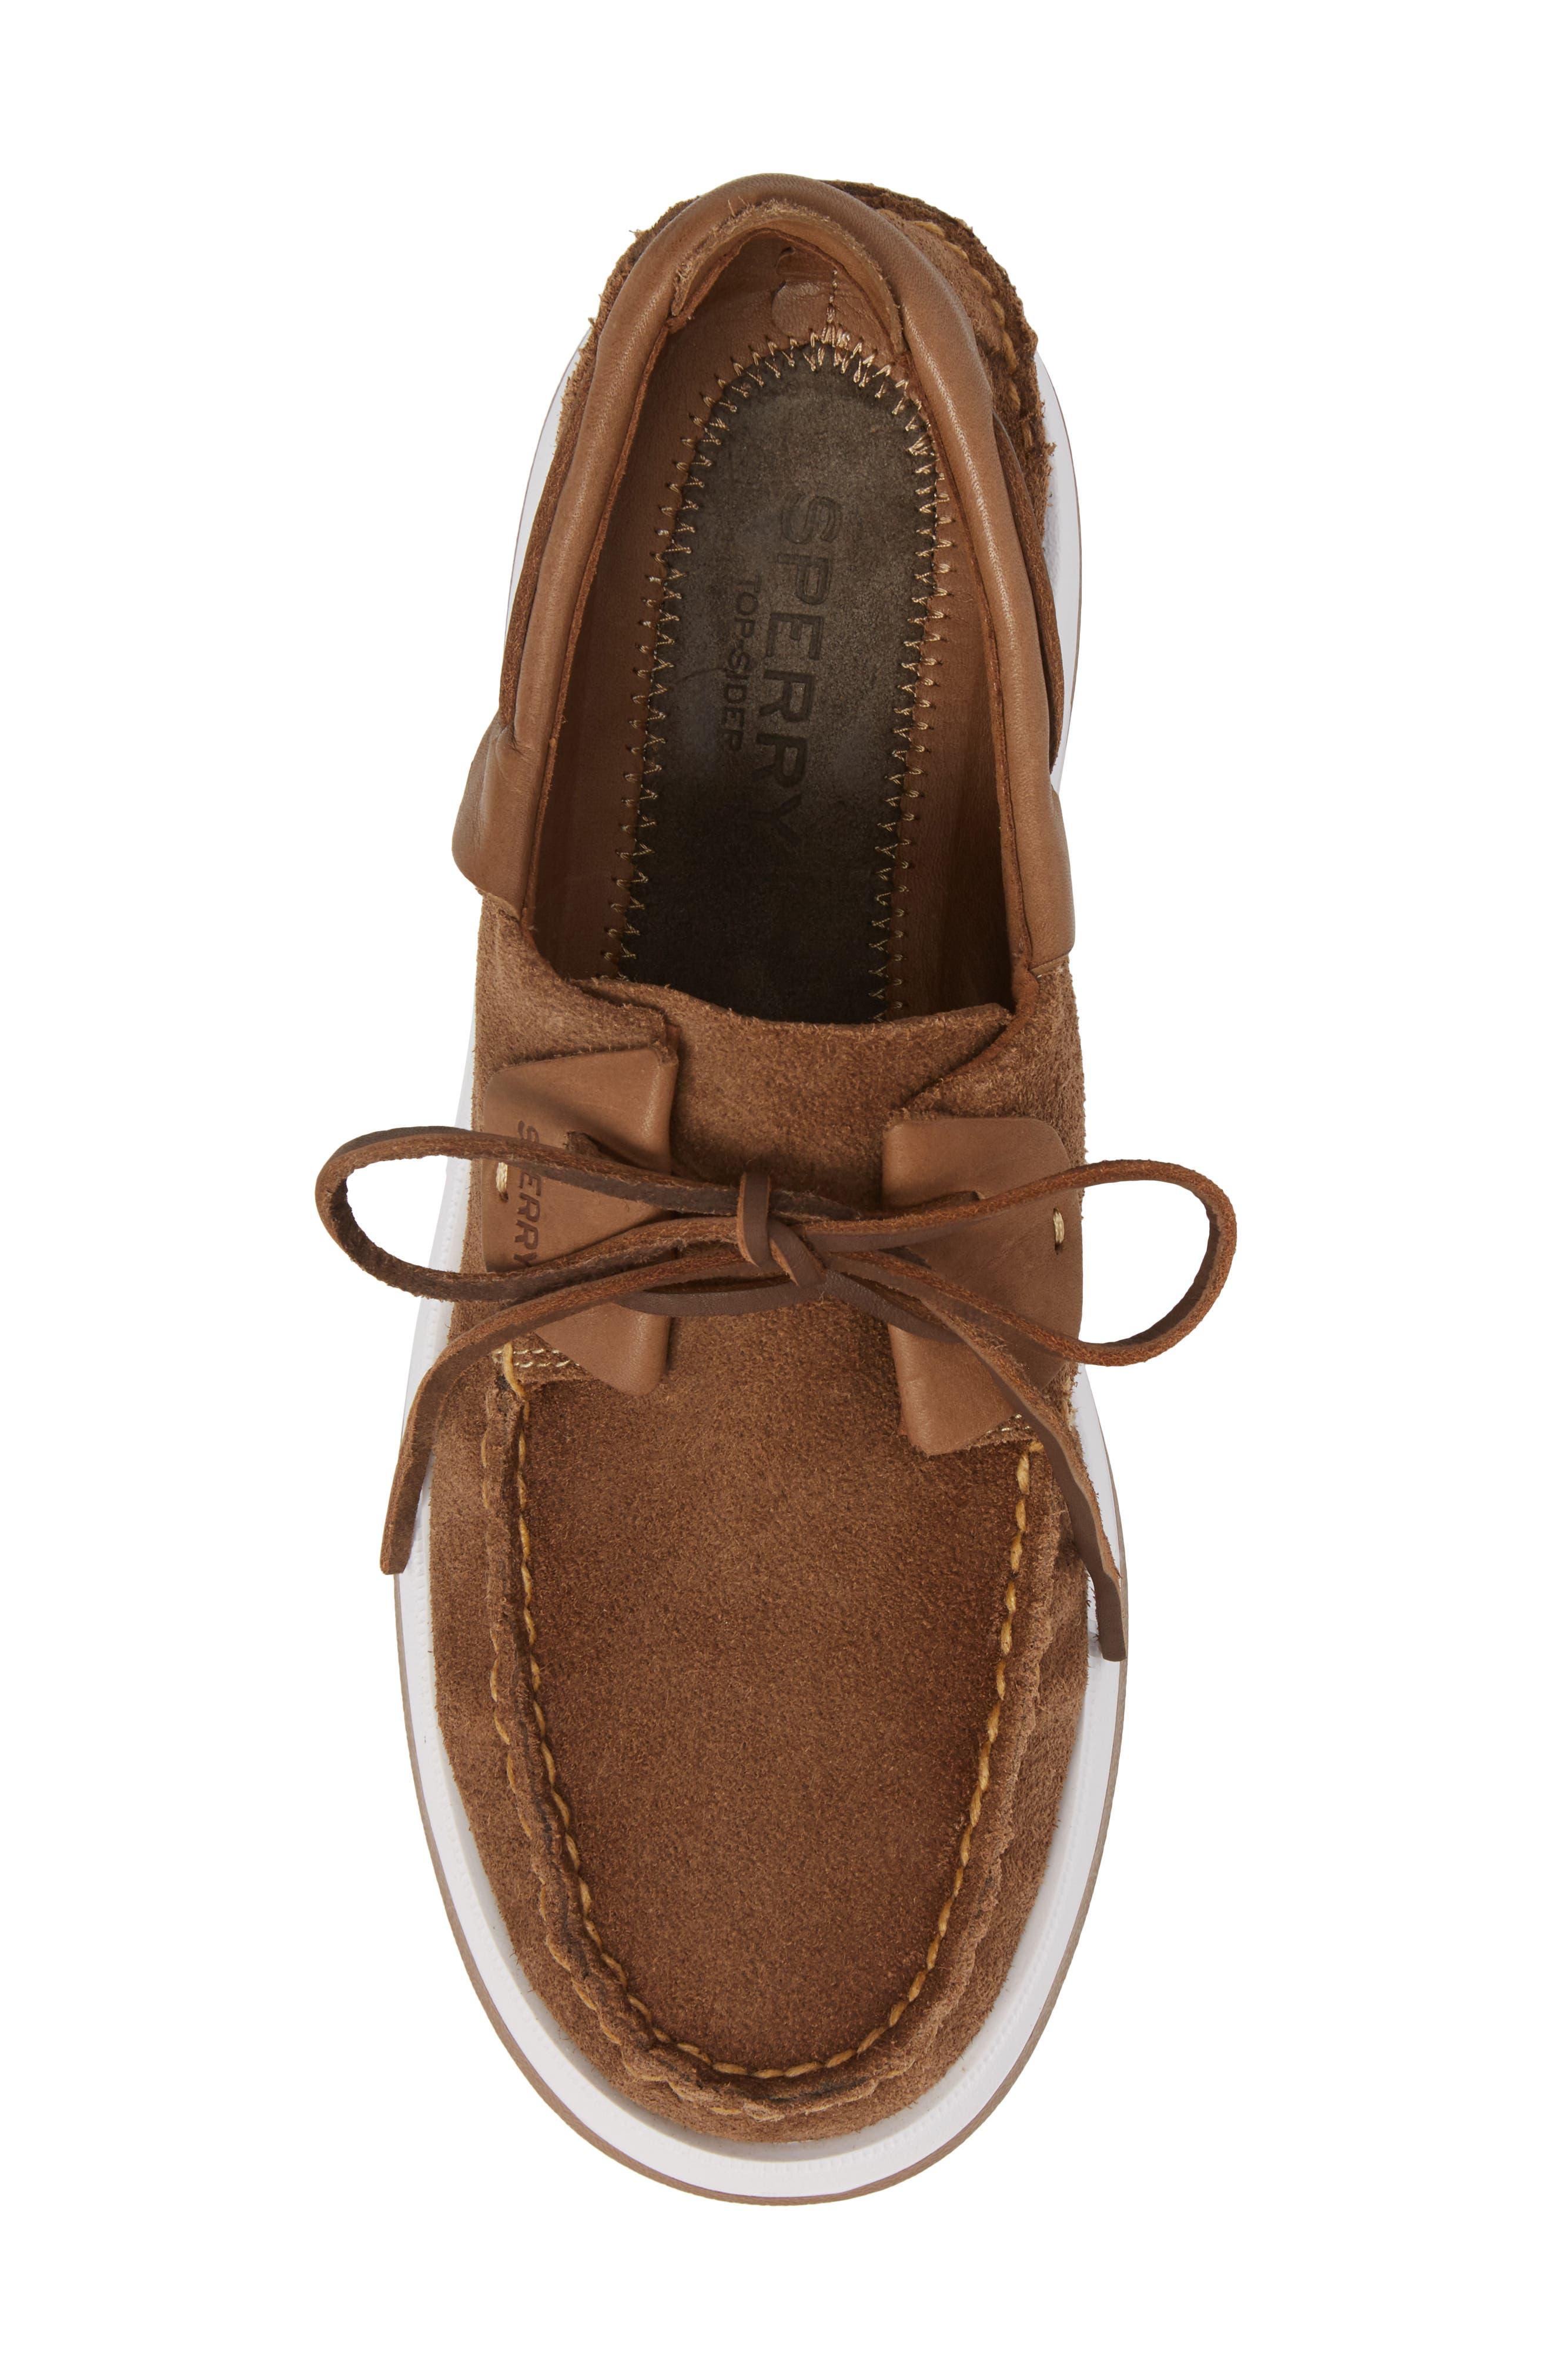 Caspian Boat Shoe,                             Alternate thumbnail 5, color,                             Tan Leather/ Suede